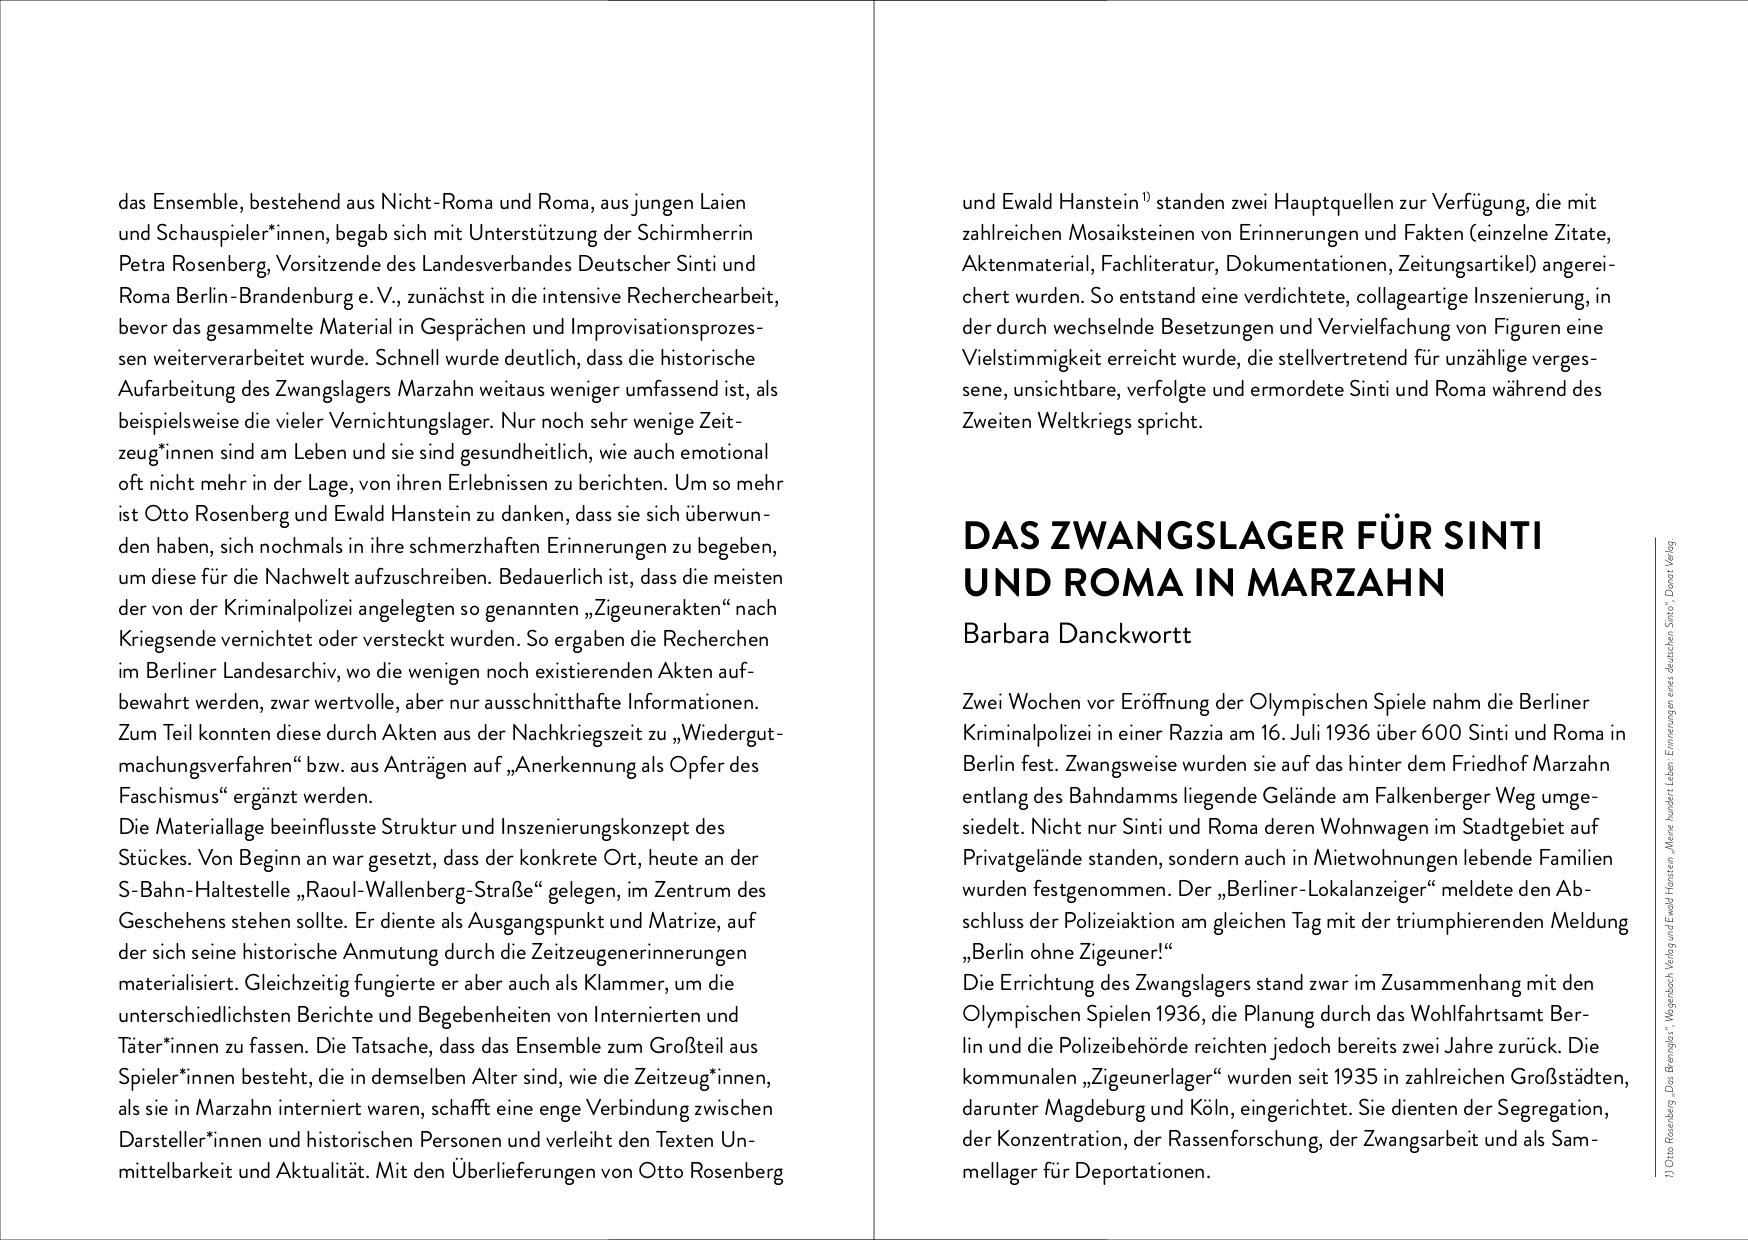 Doku-Broschüre_spreeagenten_RAM_Bro_28-Seiter_A5_03_15.12.17_S22+23.jpg